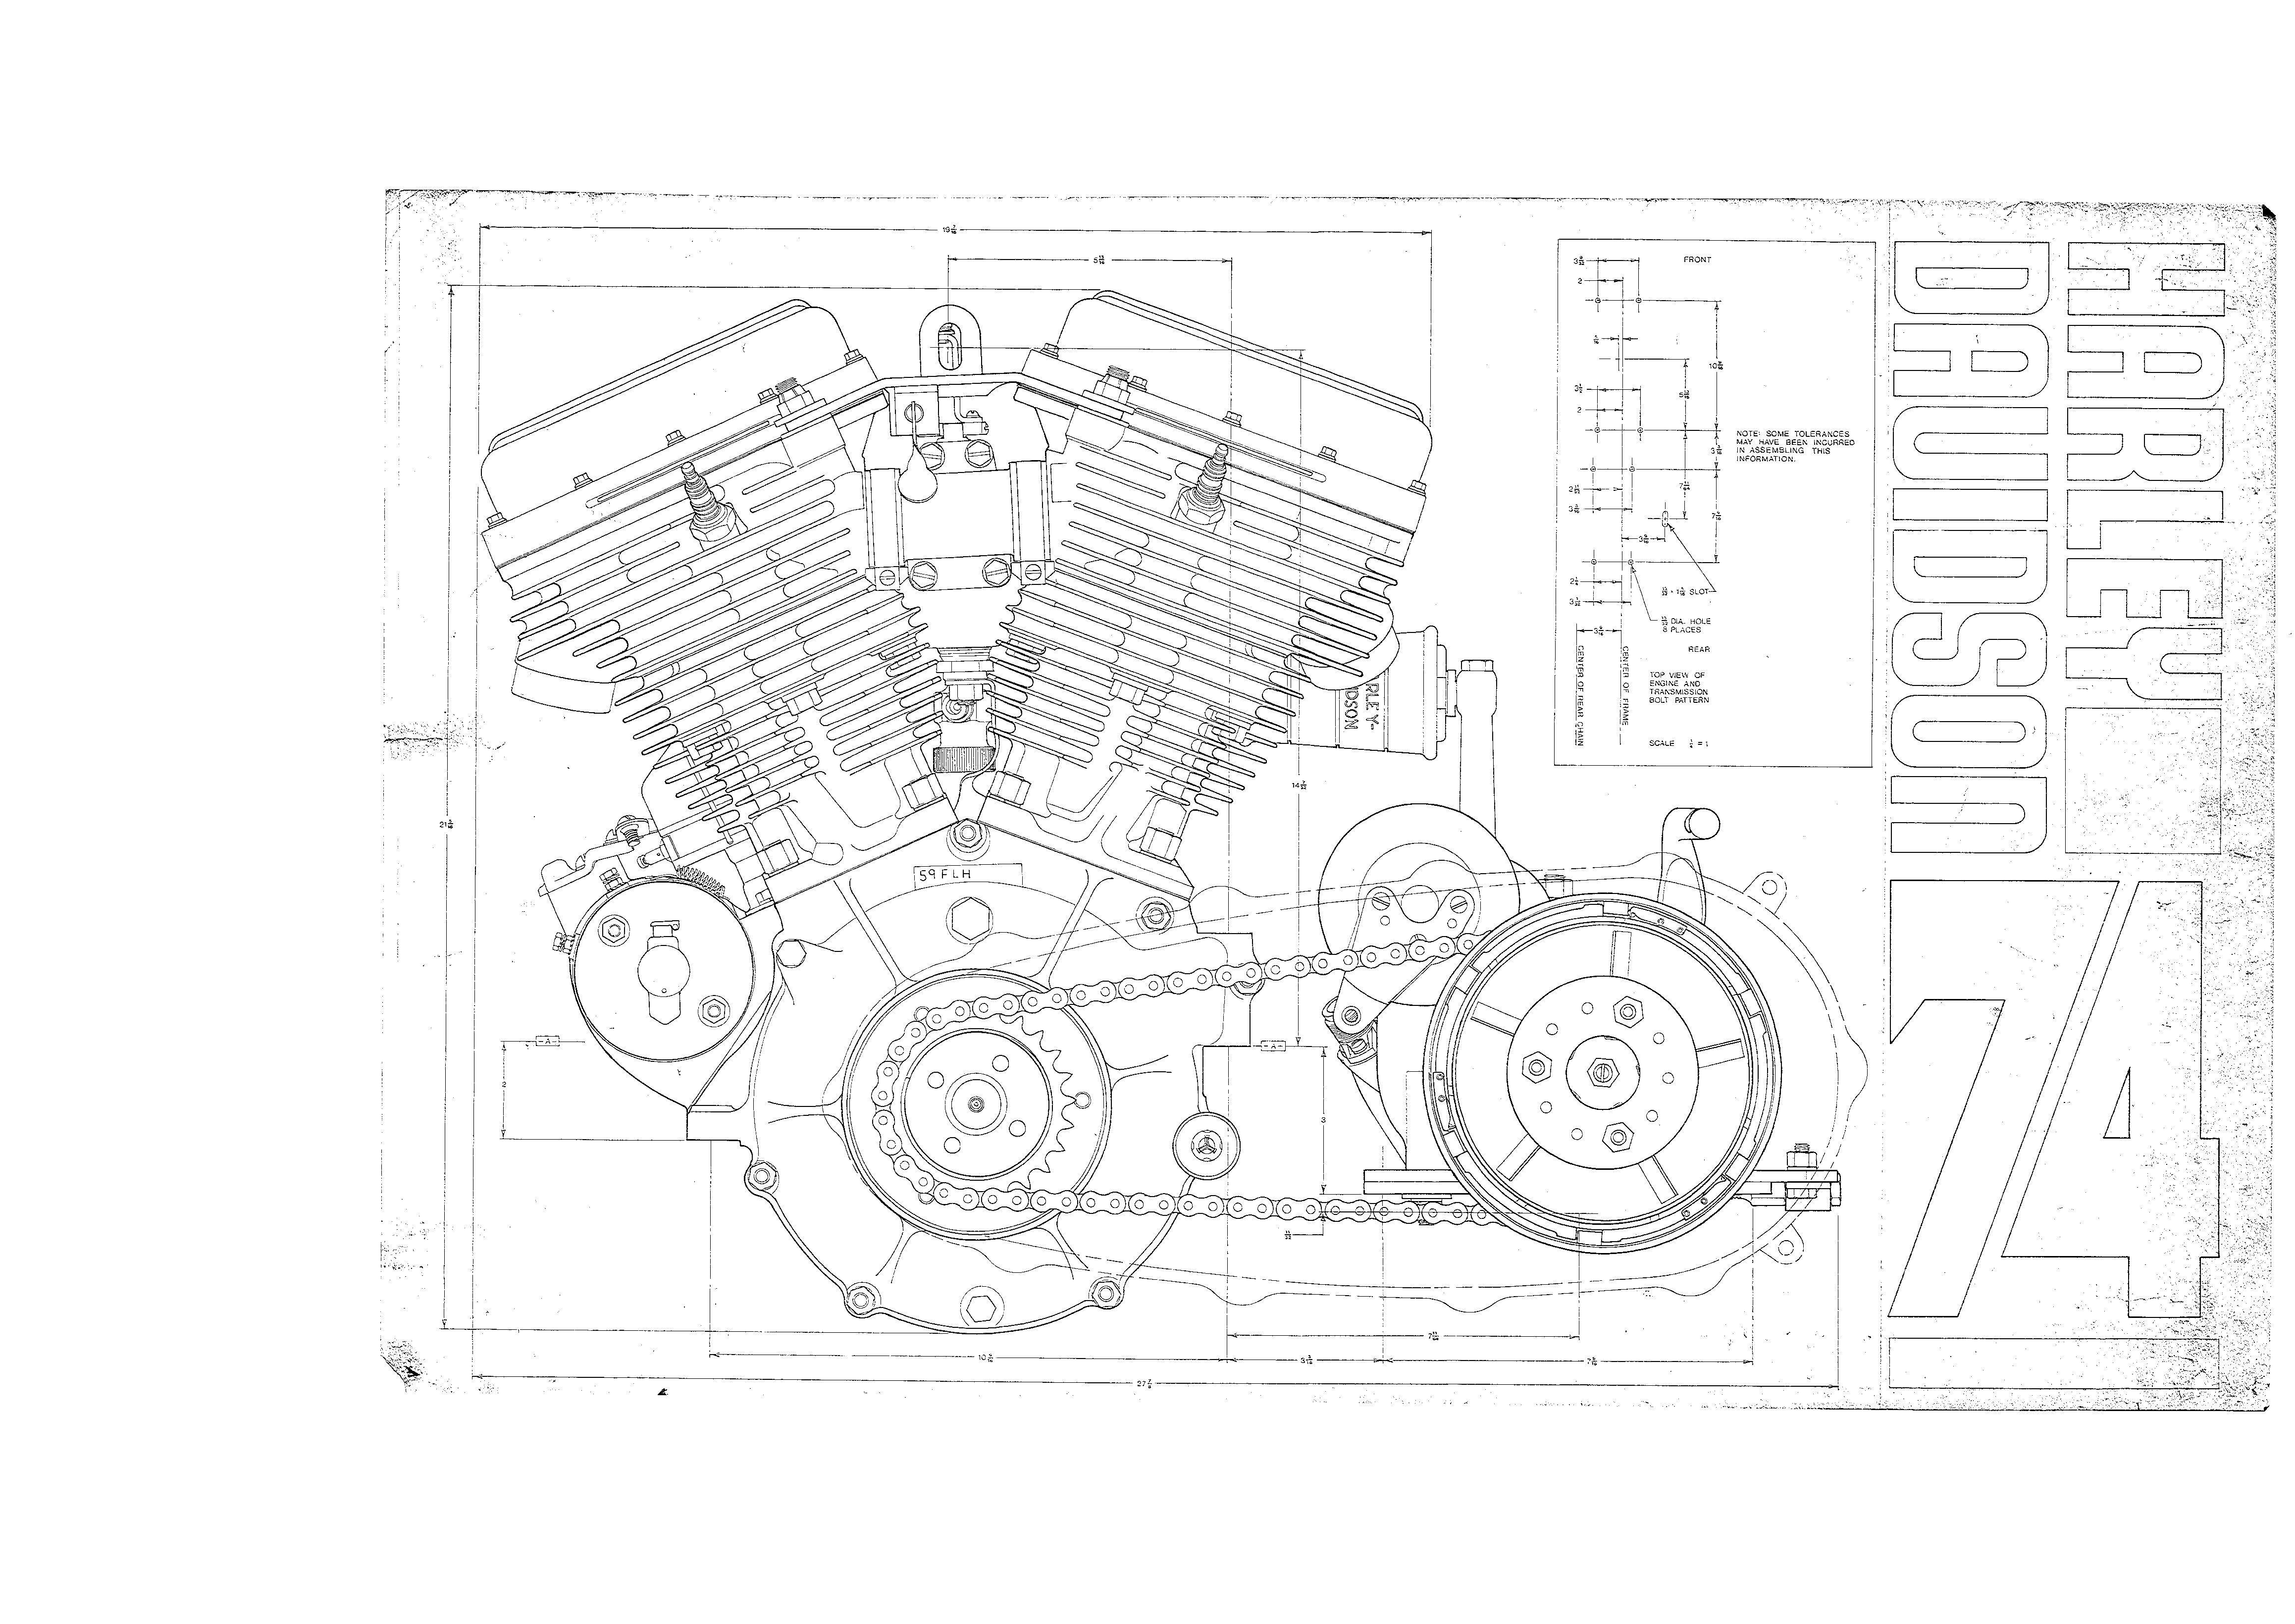 hight resolution of harley davidson motor harley davidson forum bike engine prop design custom harleys character design references engineering motorcycle